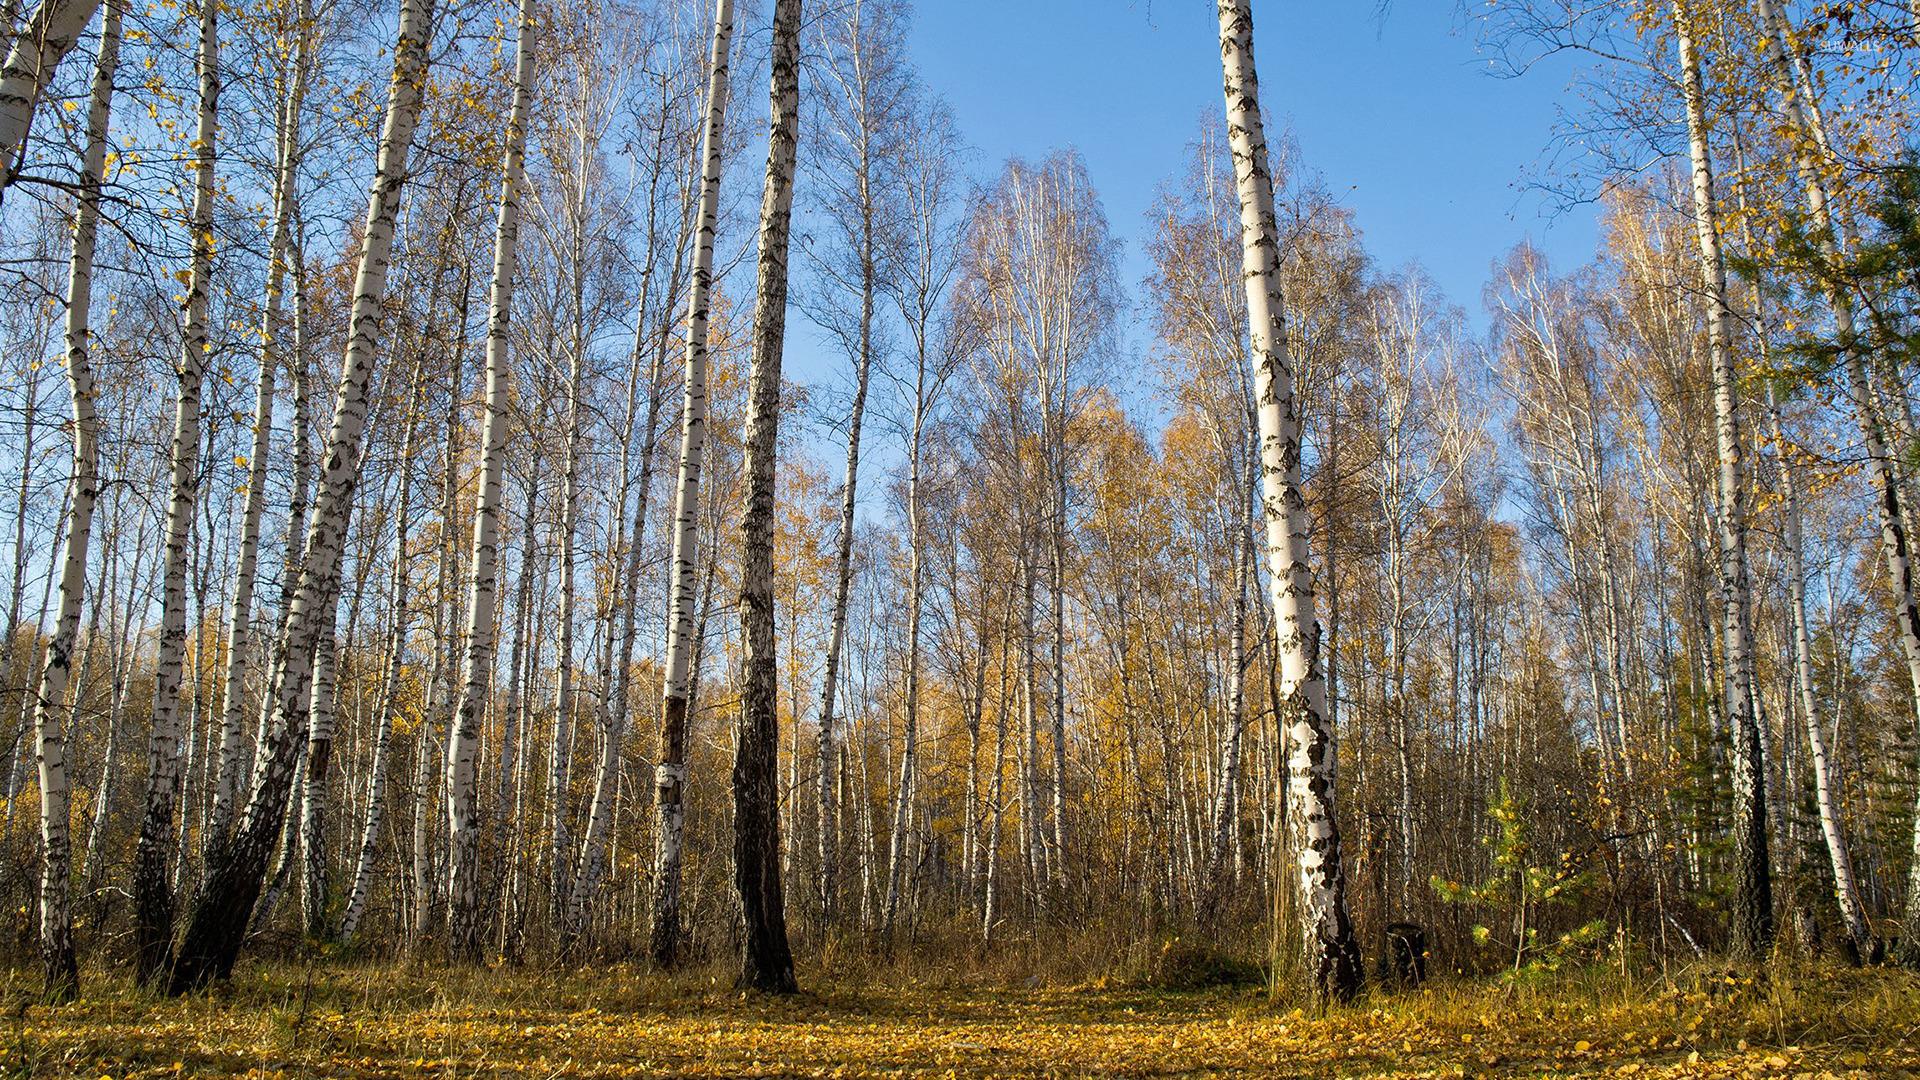 [50+] Wallpaper with Birch Trees on WallpaperSafari